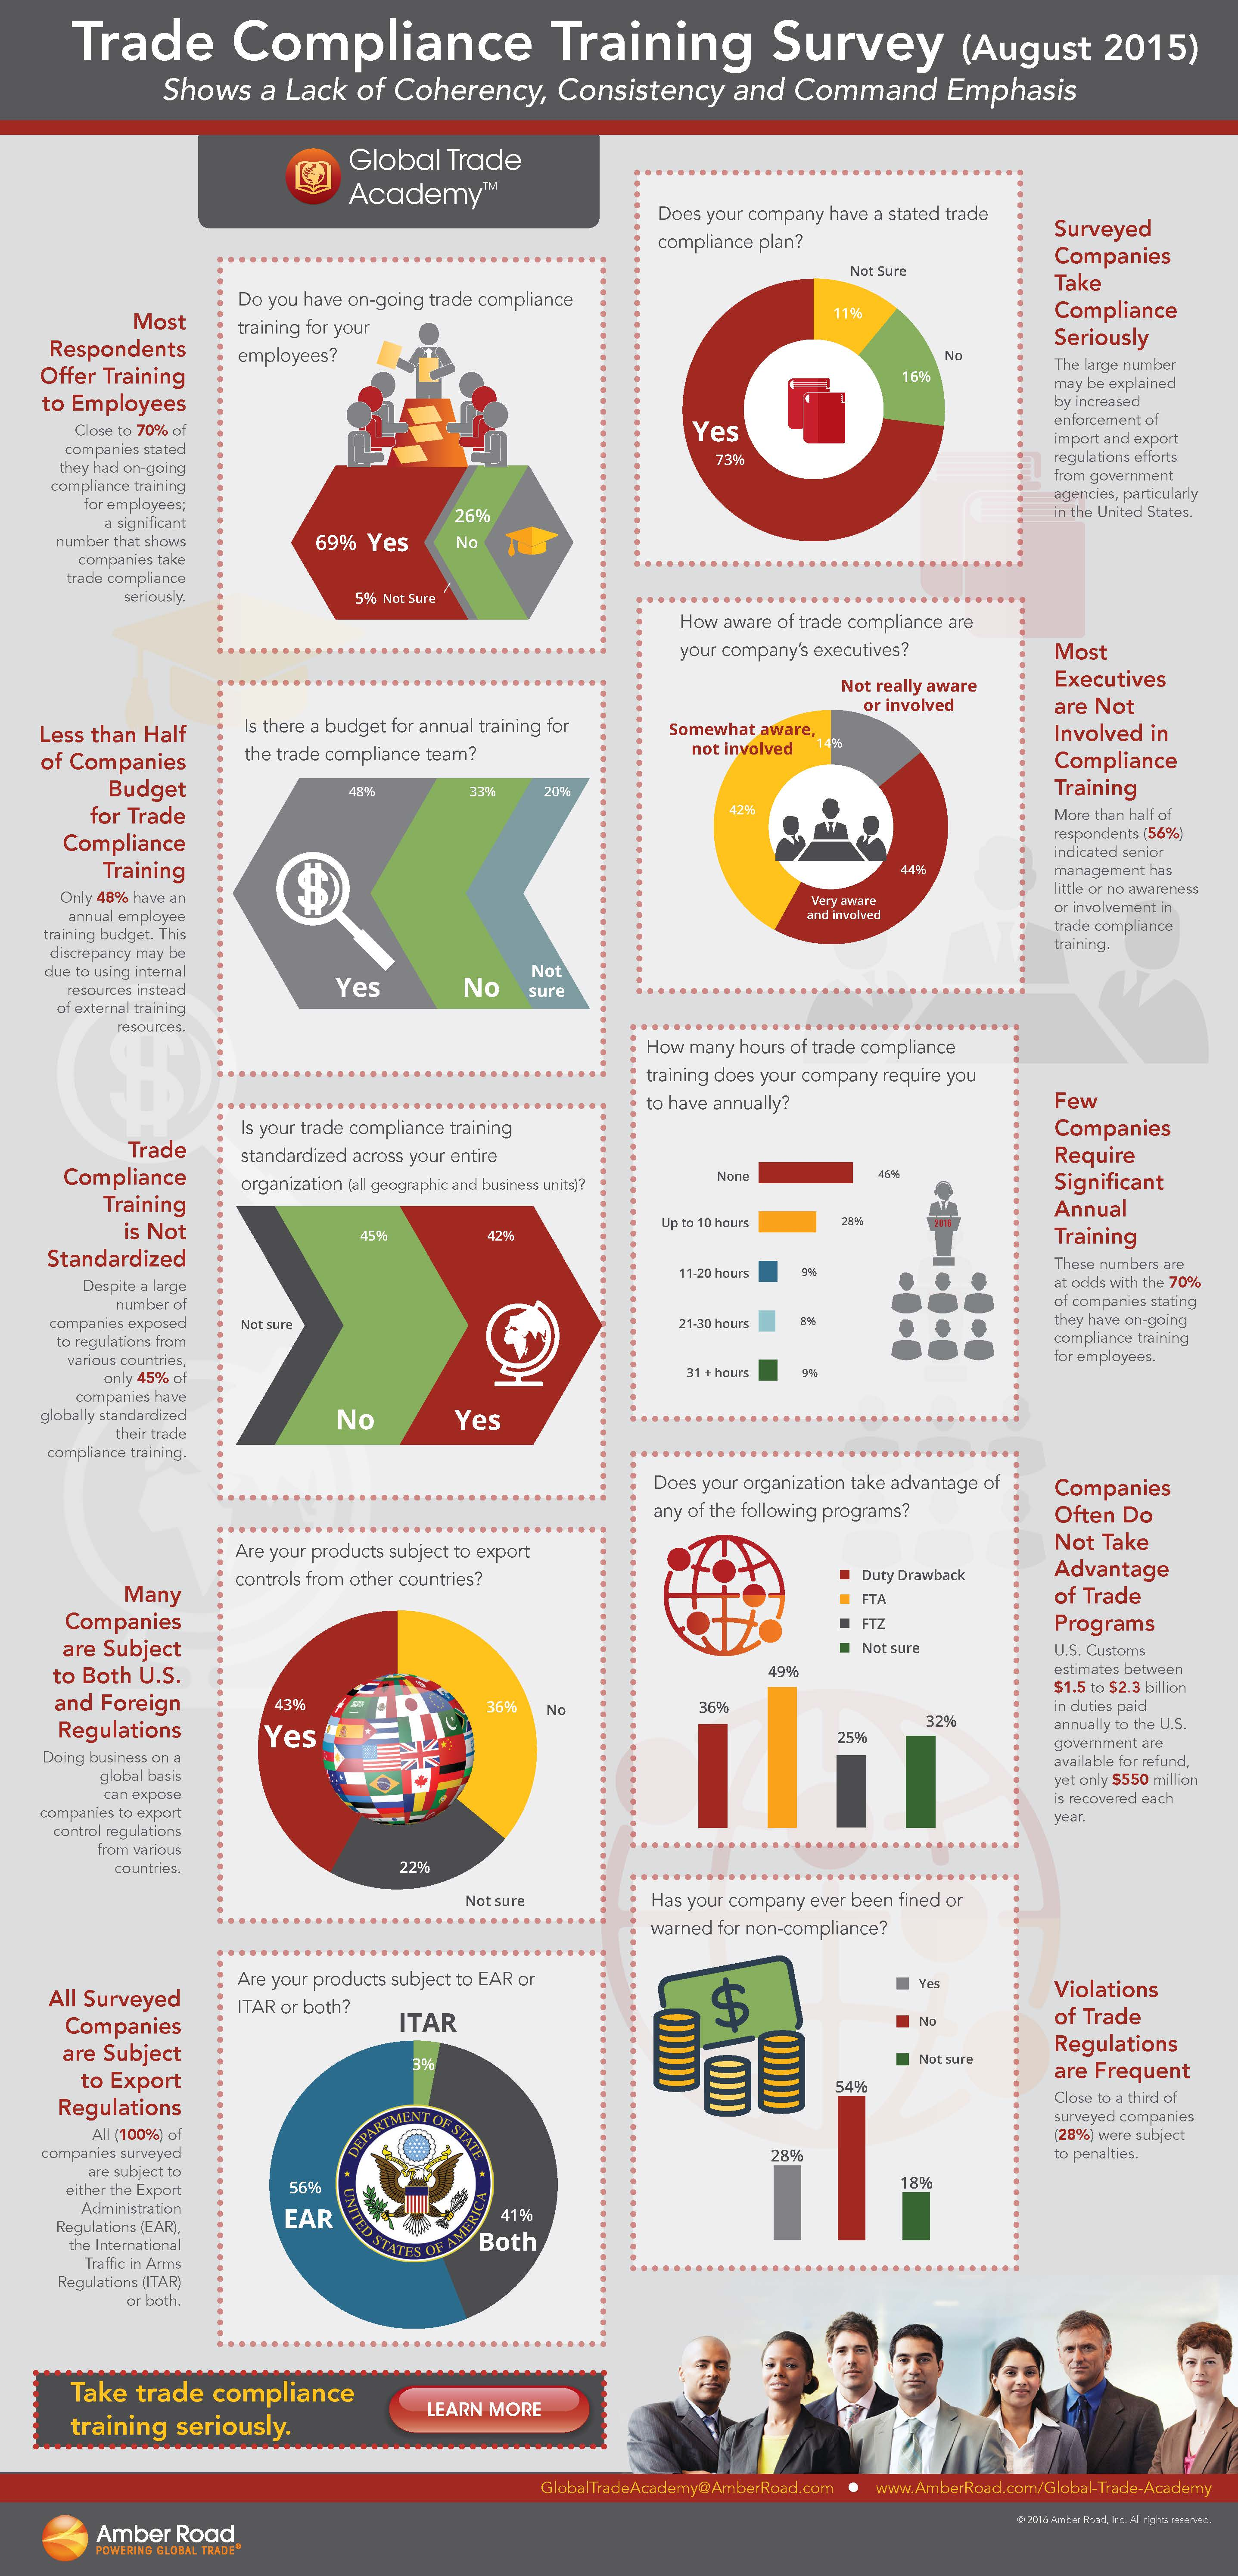 GTA_Training_Survey_Infographic.jpg